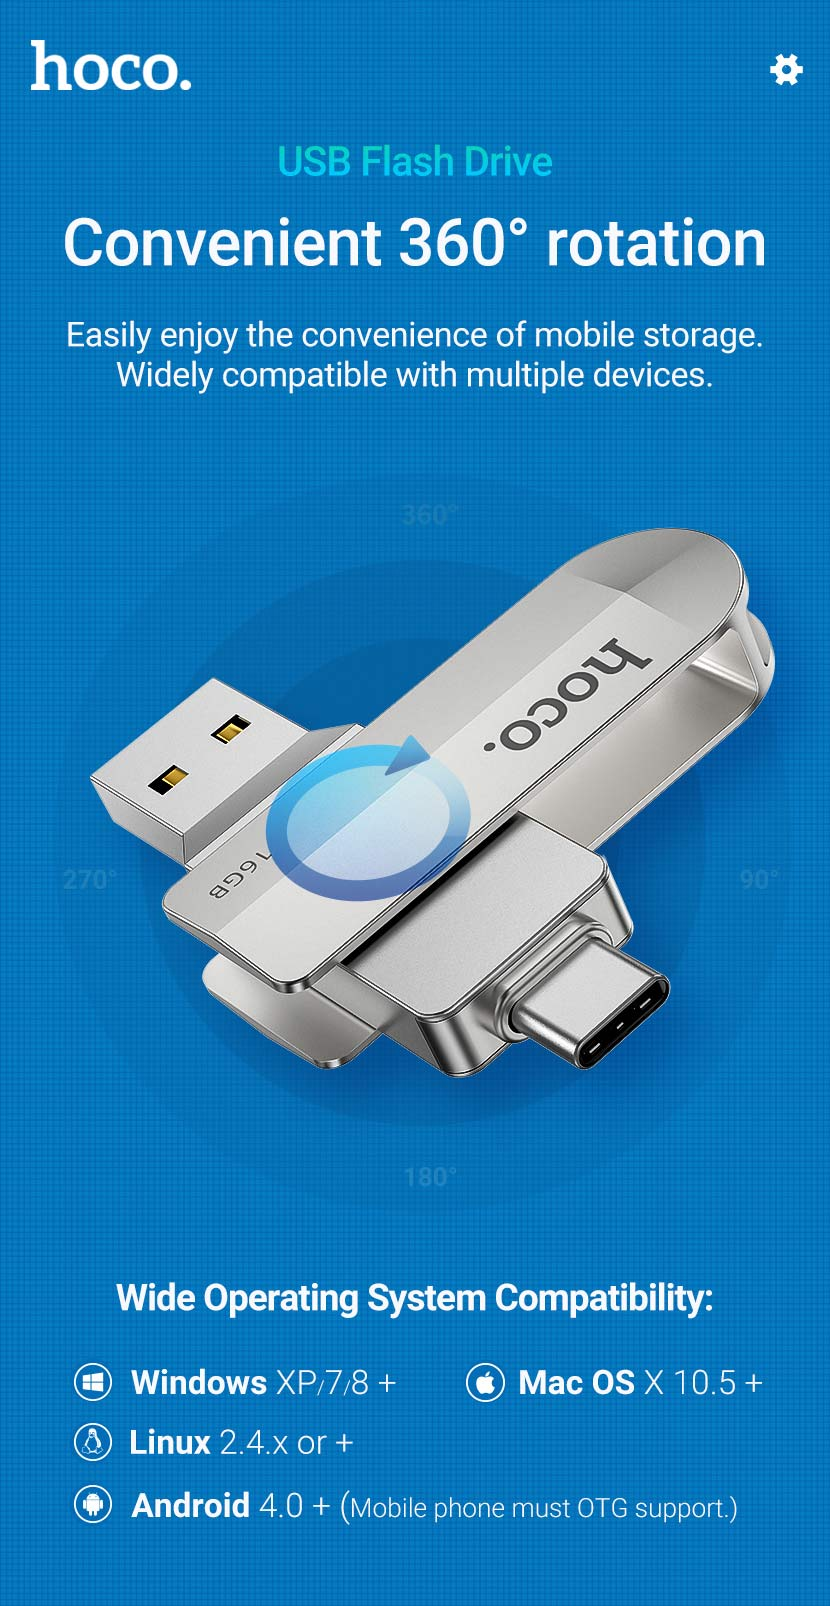 hoco news ud10 wise type c usb flash drive rotation en